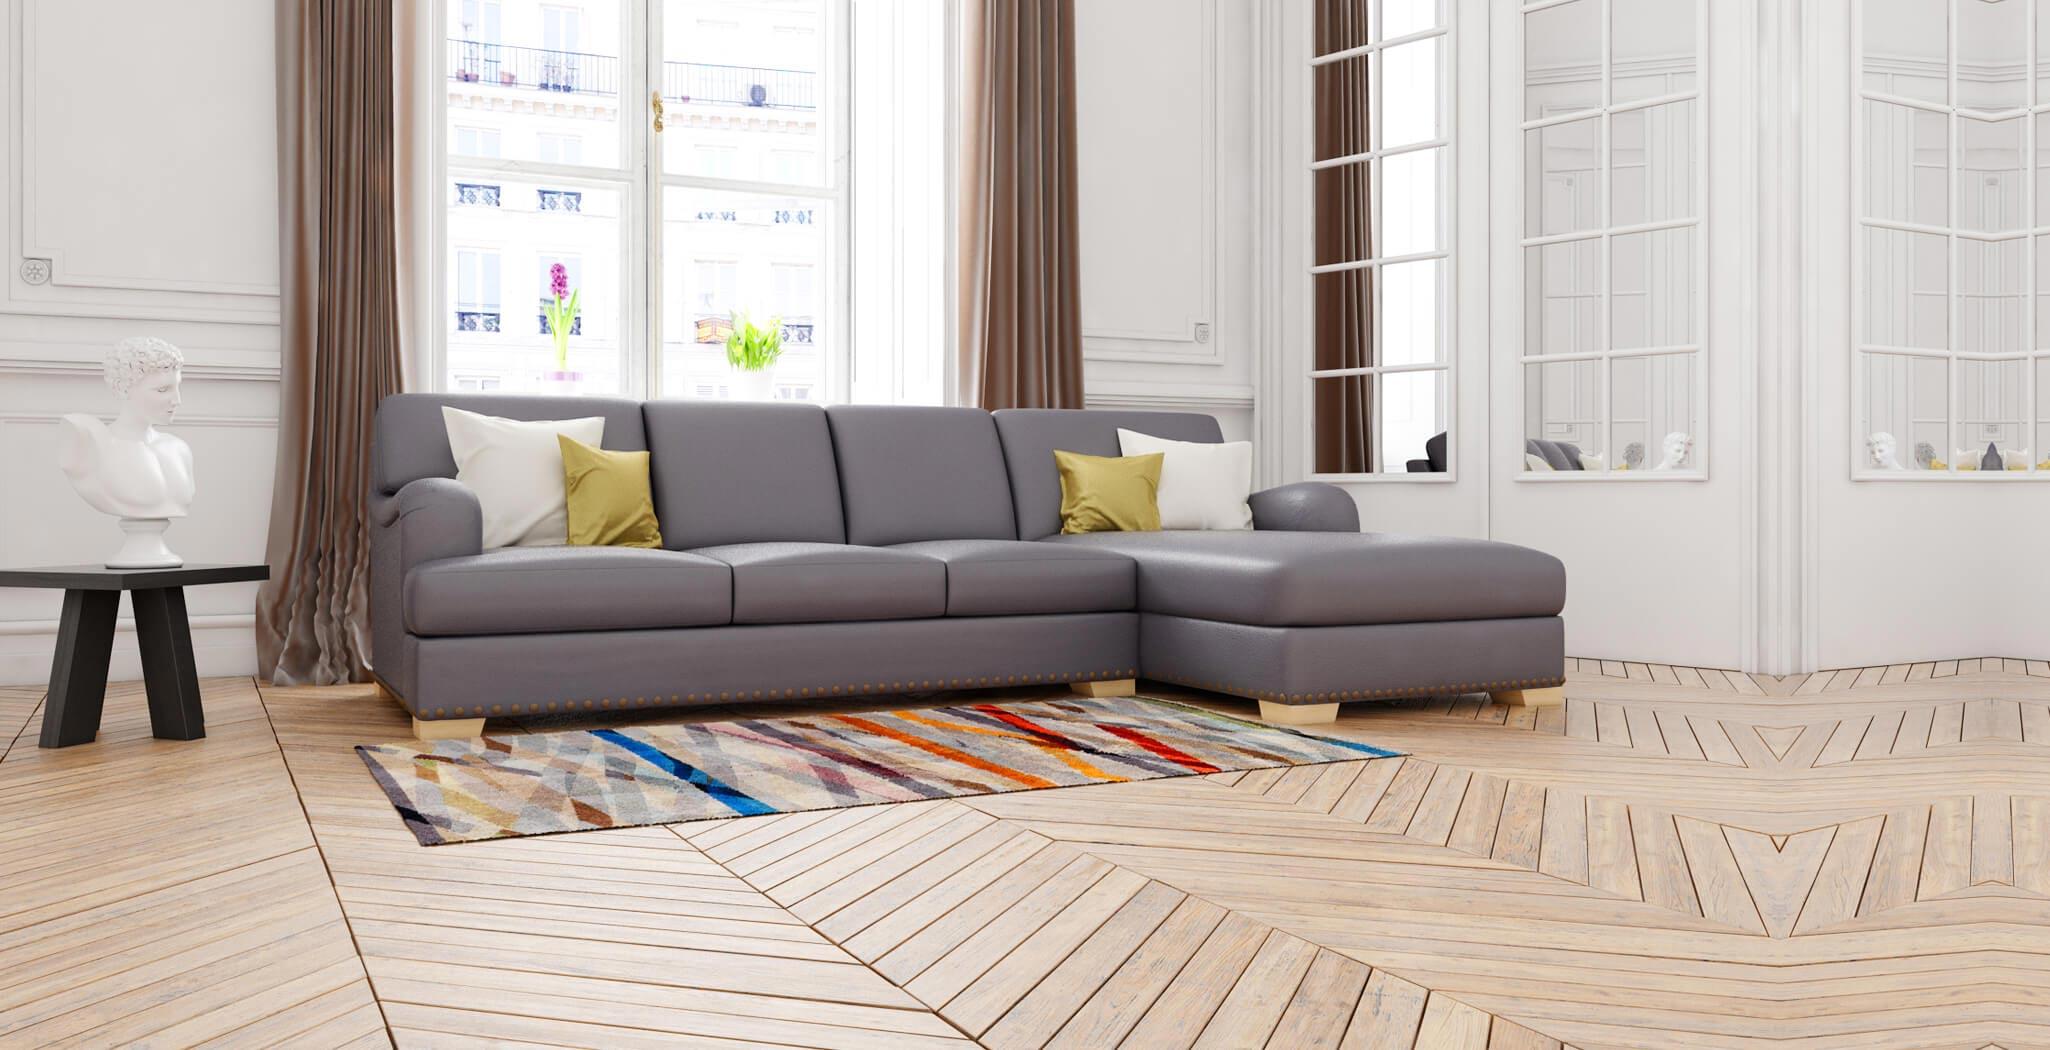 brighton panel furniture gallery 3